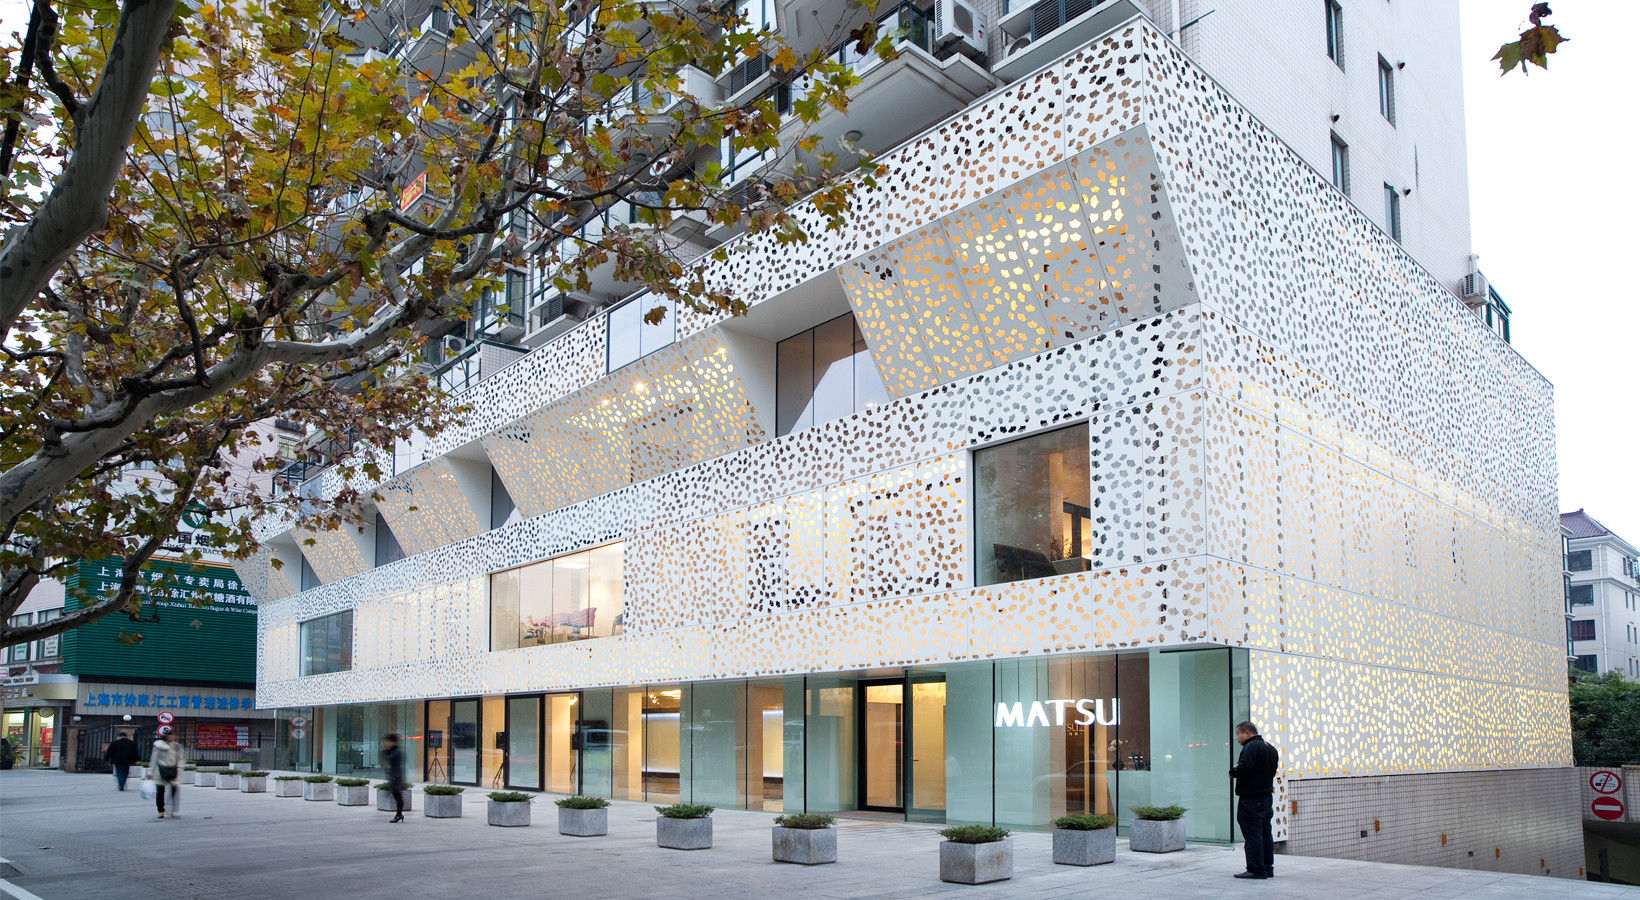 Tienda Matsu / EXH Design